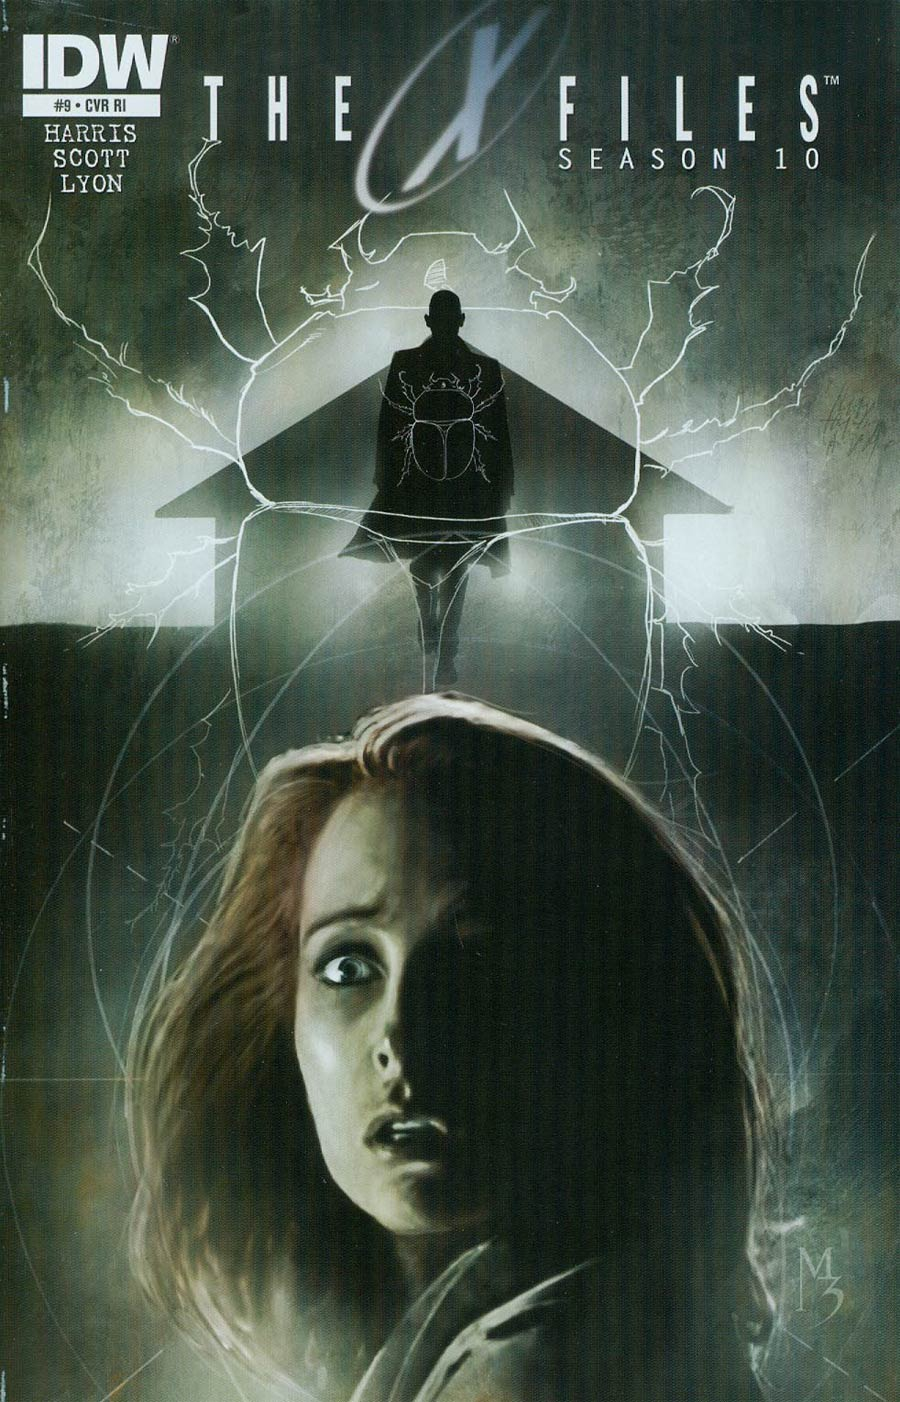 X-Files Season 10 #9 Cover C Incentive Menton3 Variant Cover